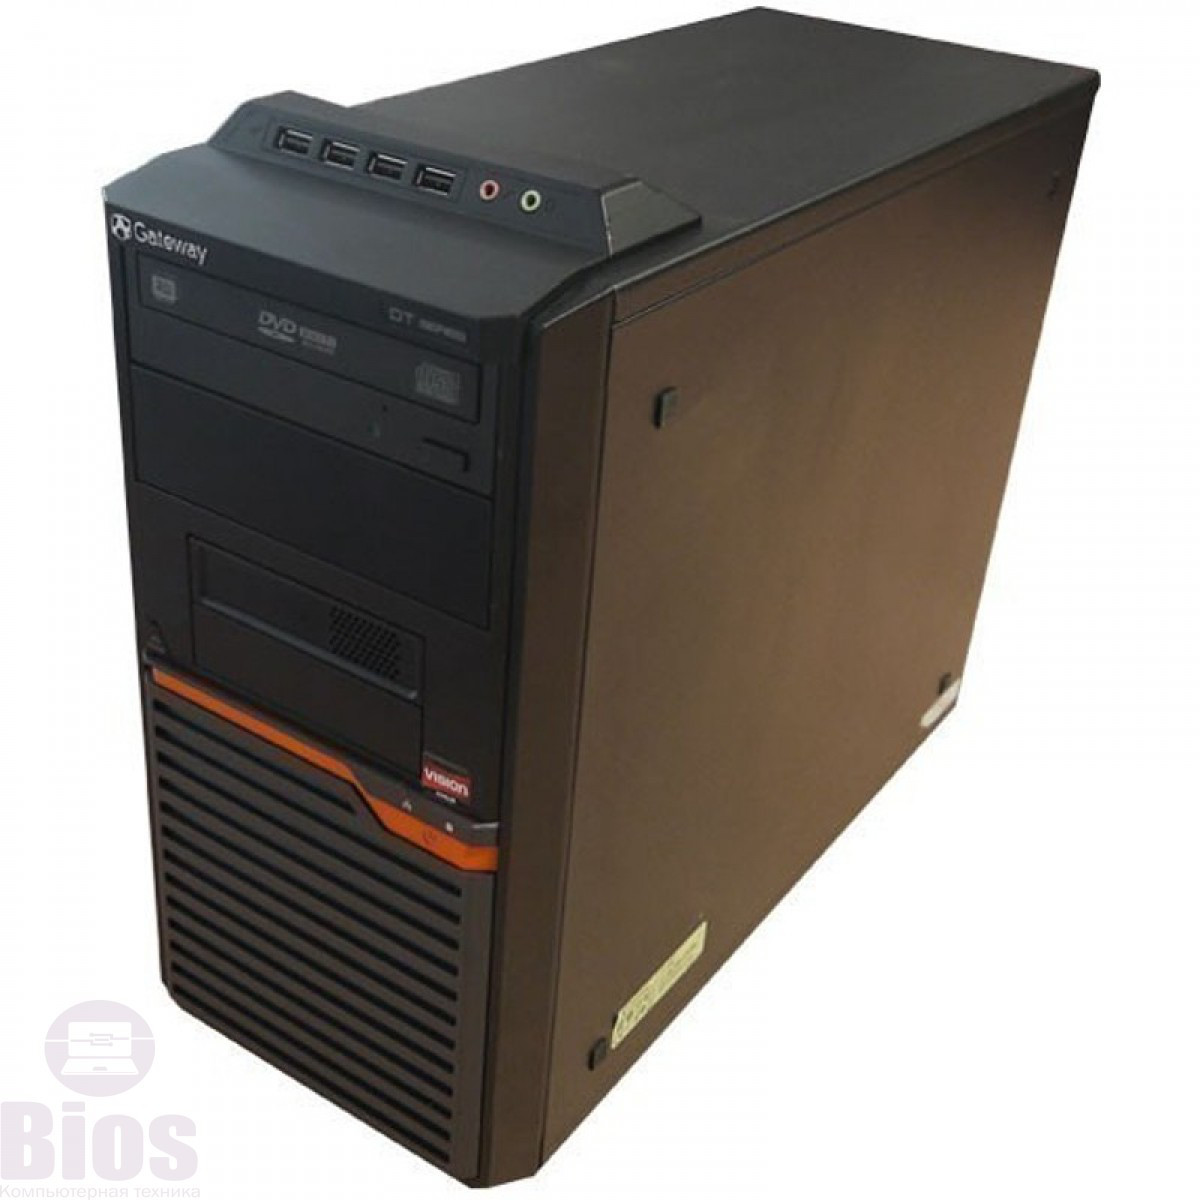 Системный блок Acer Gateway DT55 sAM3 (Athlon II 255/NoRAM/NoHDD) б/у